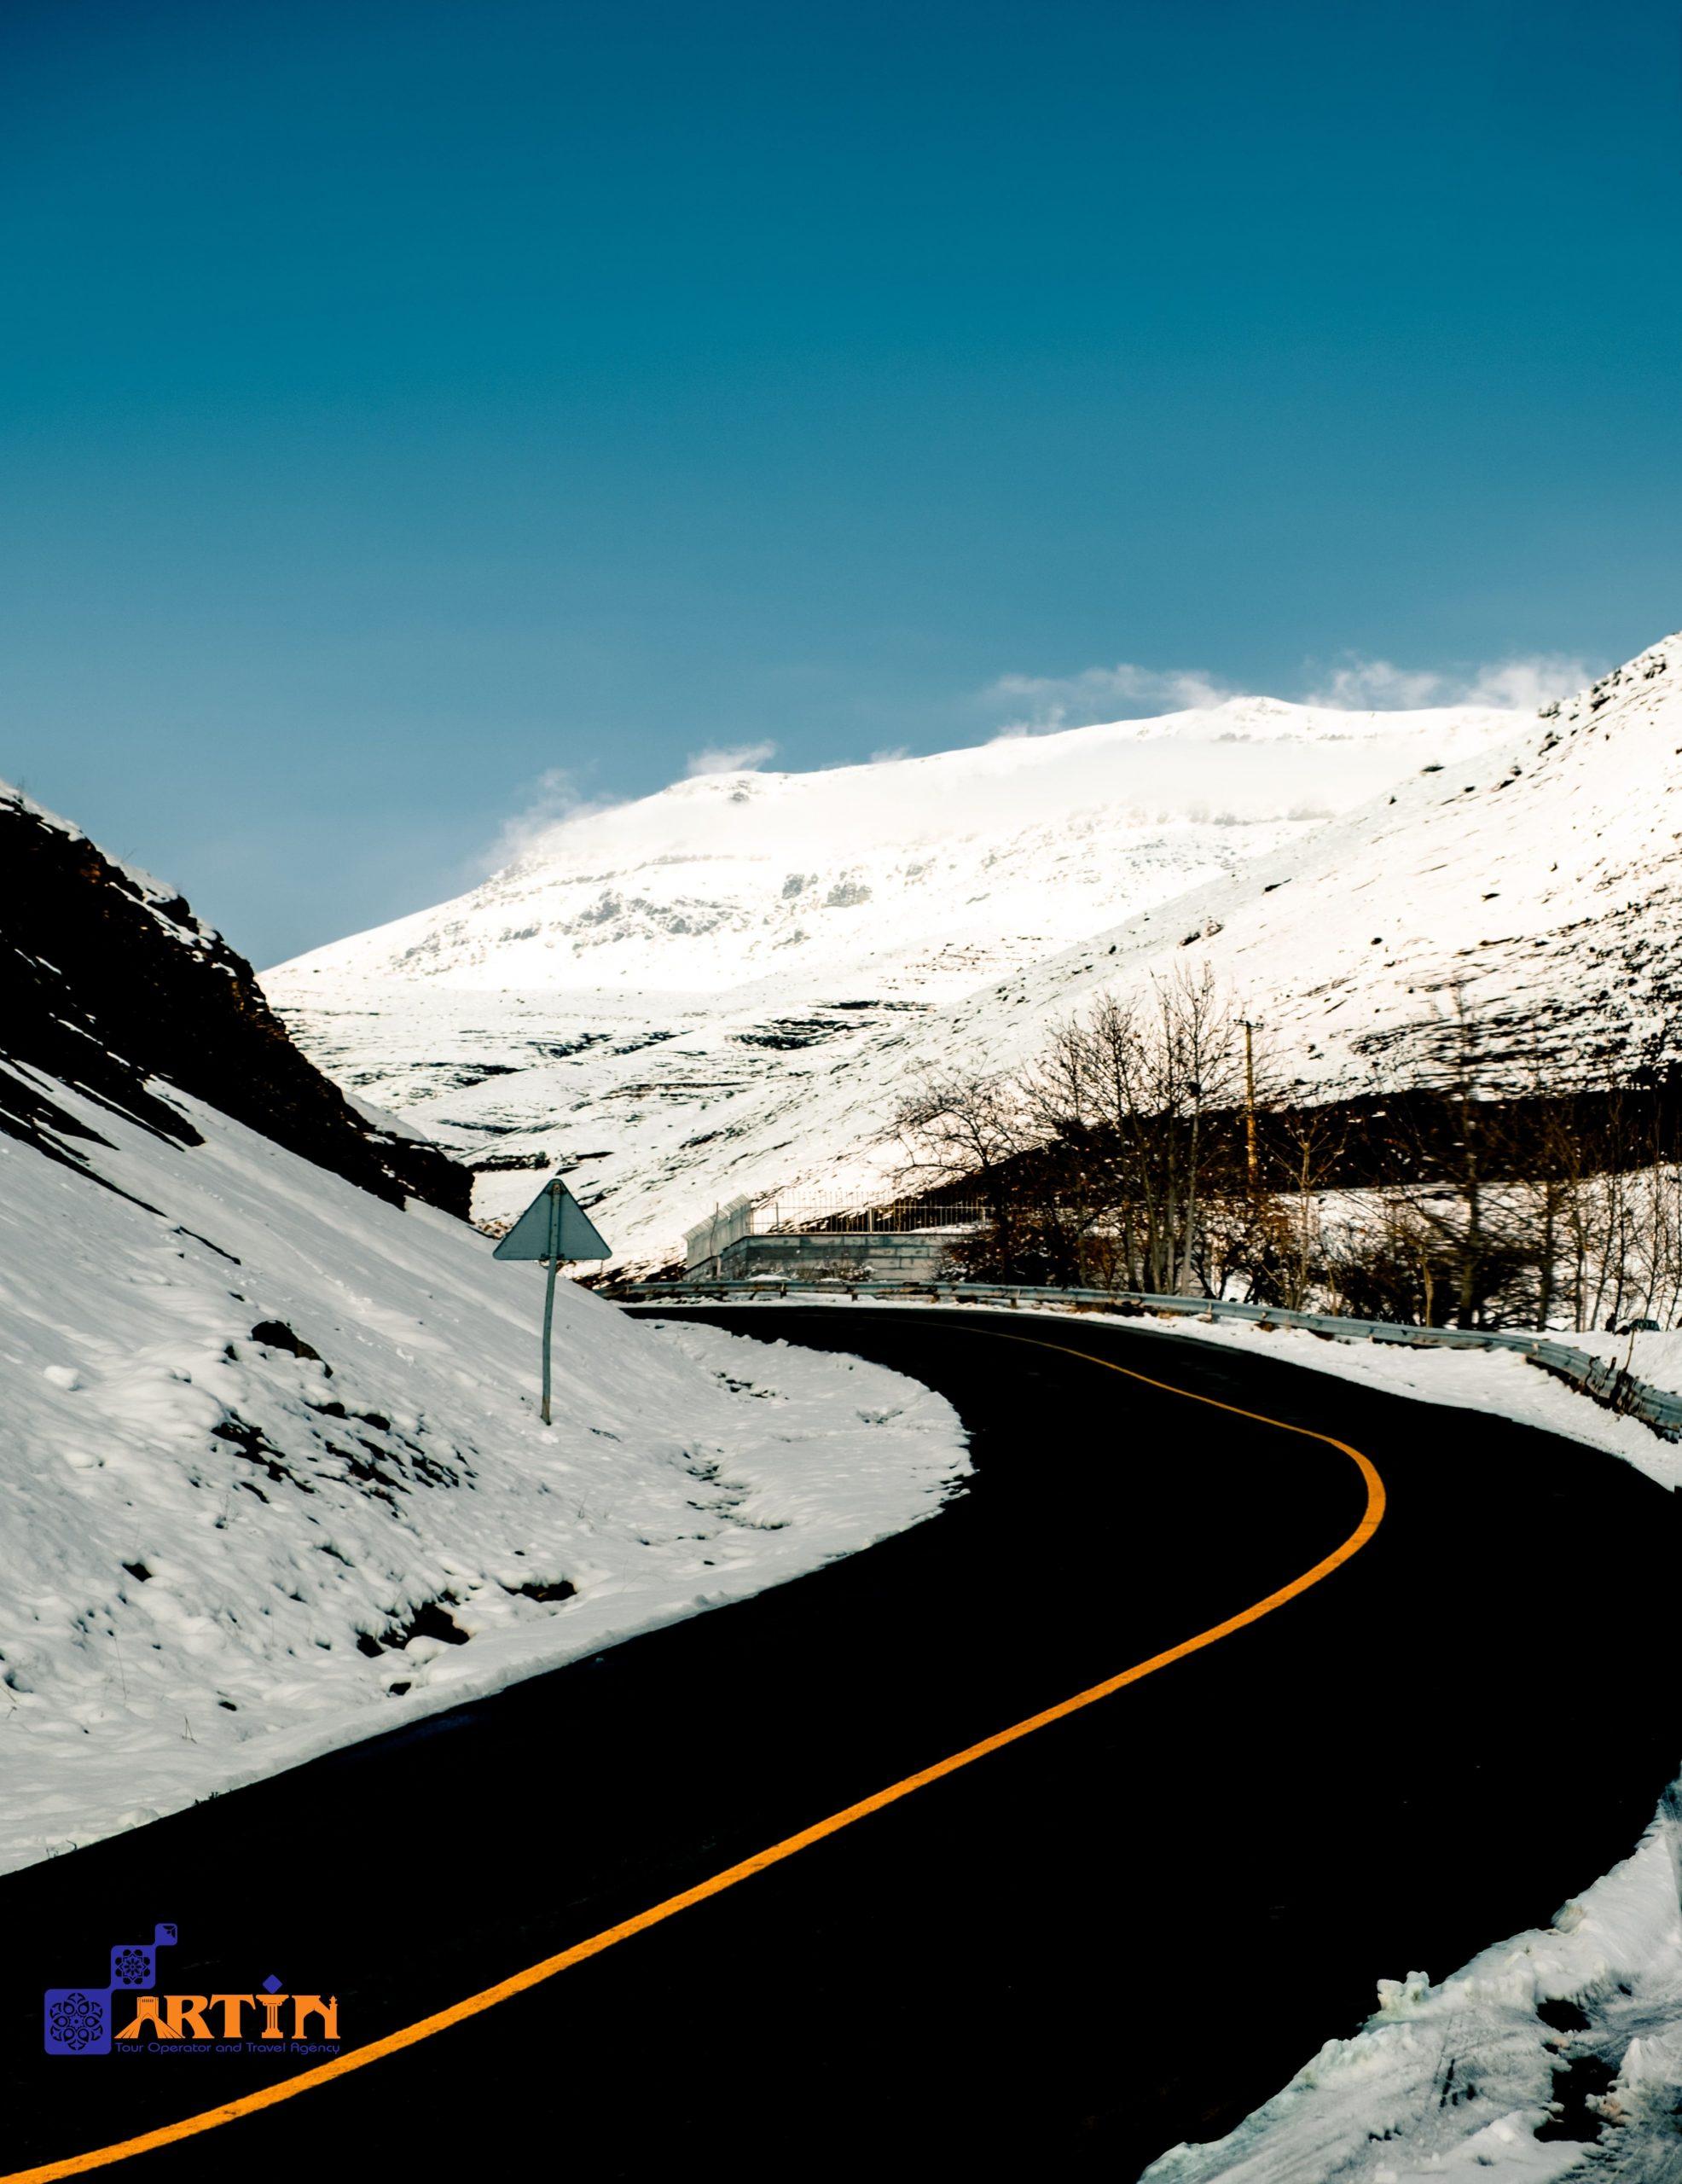 Iran roads and streets car rental travelartin.com